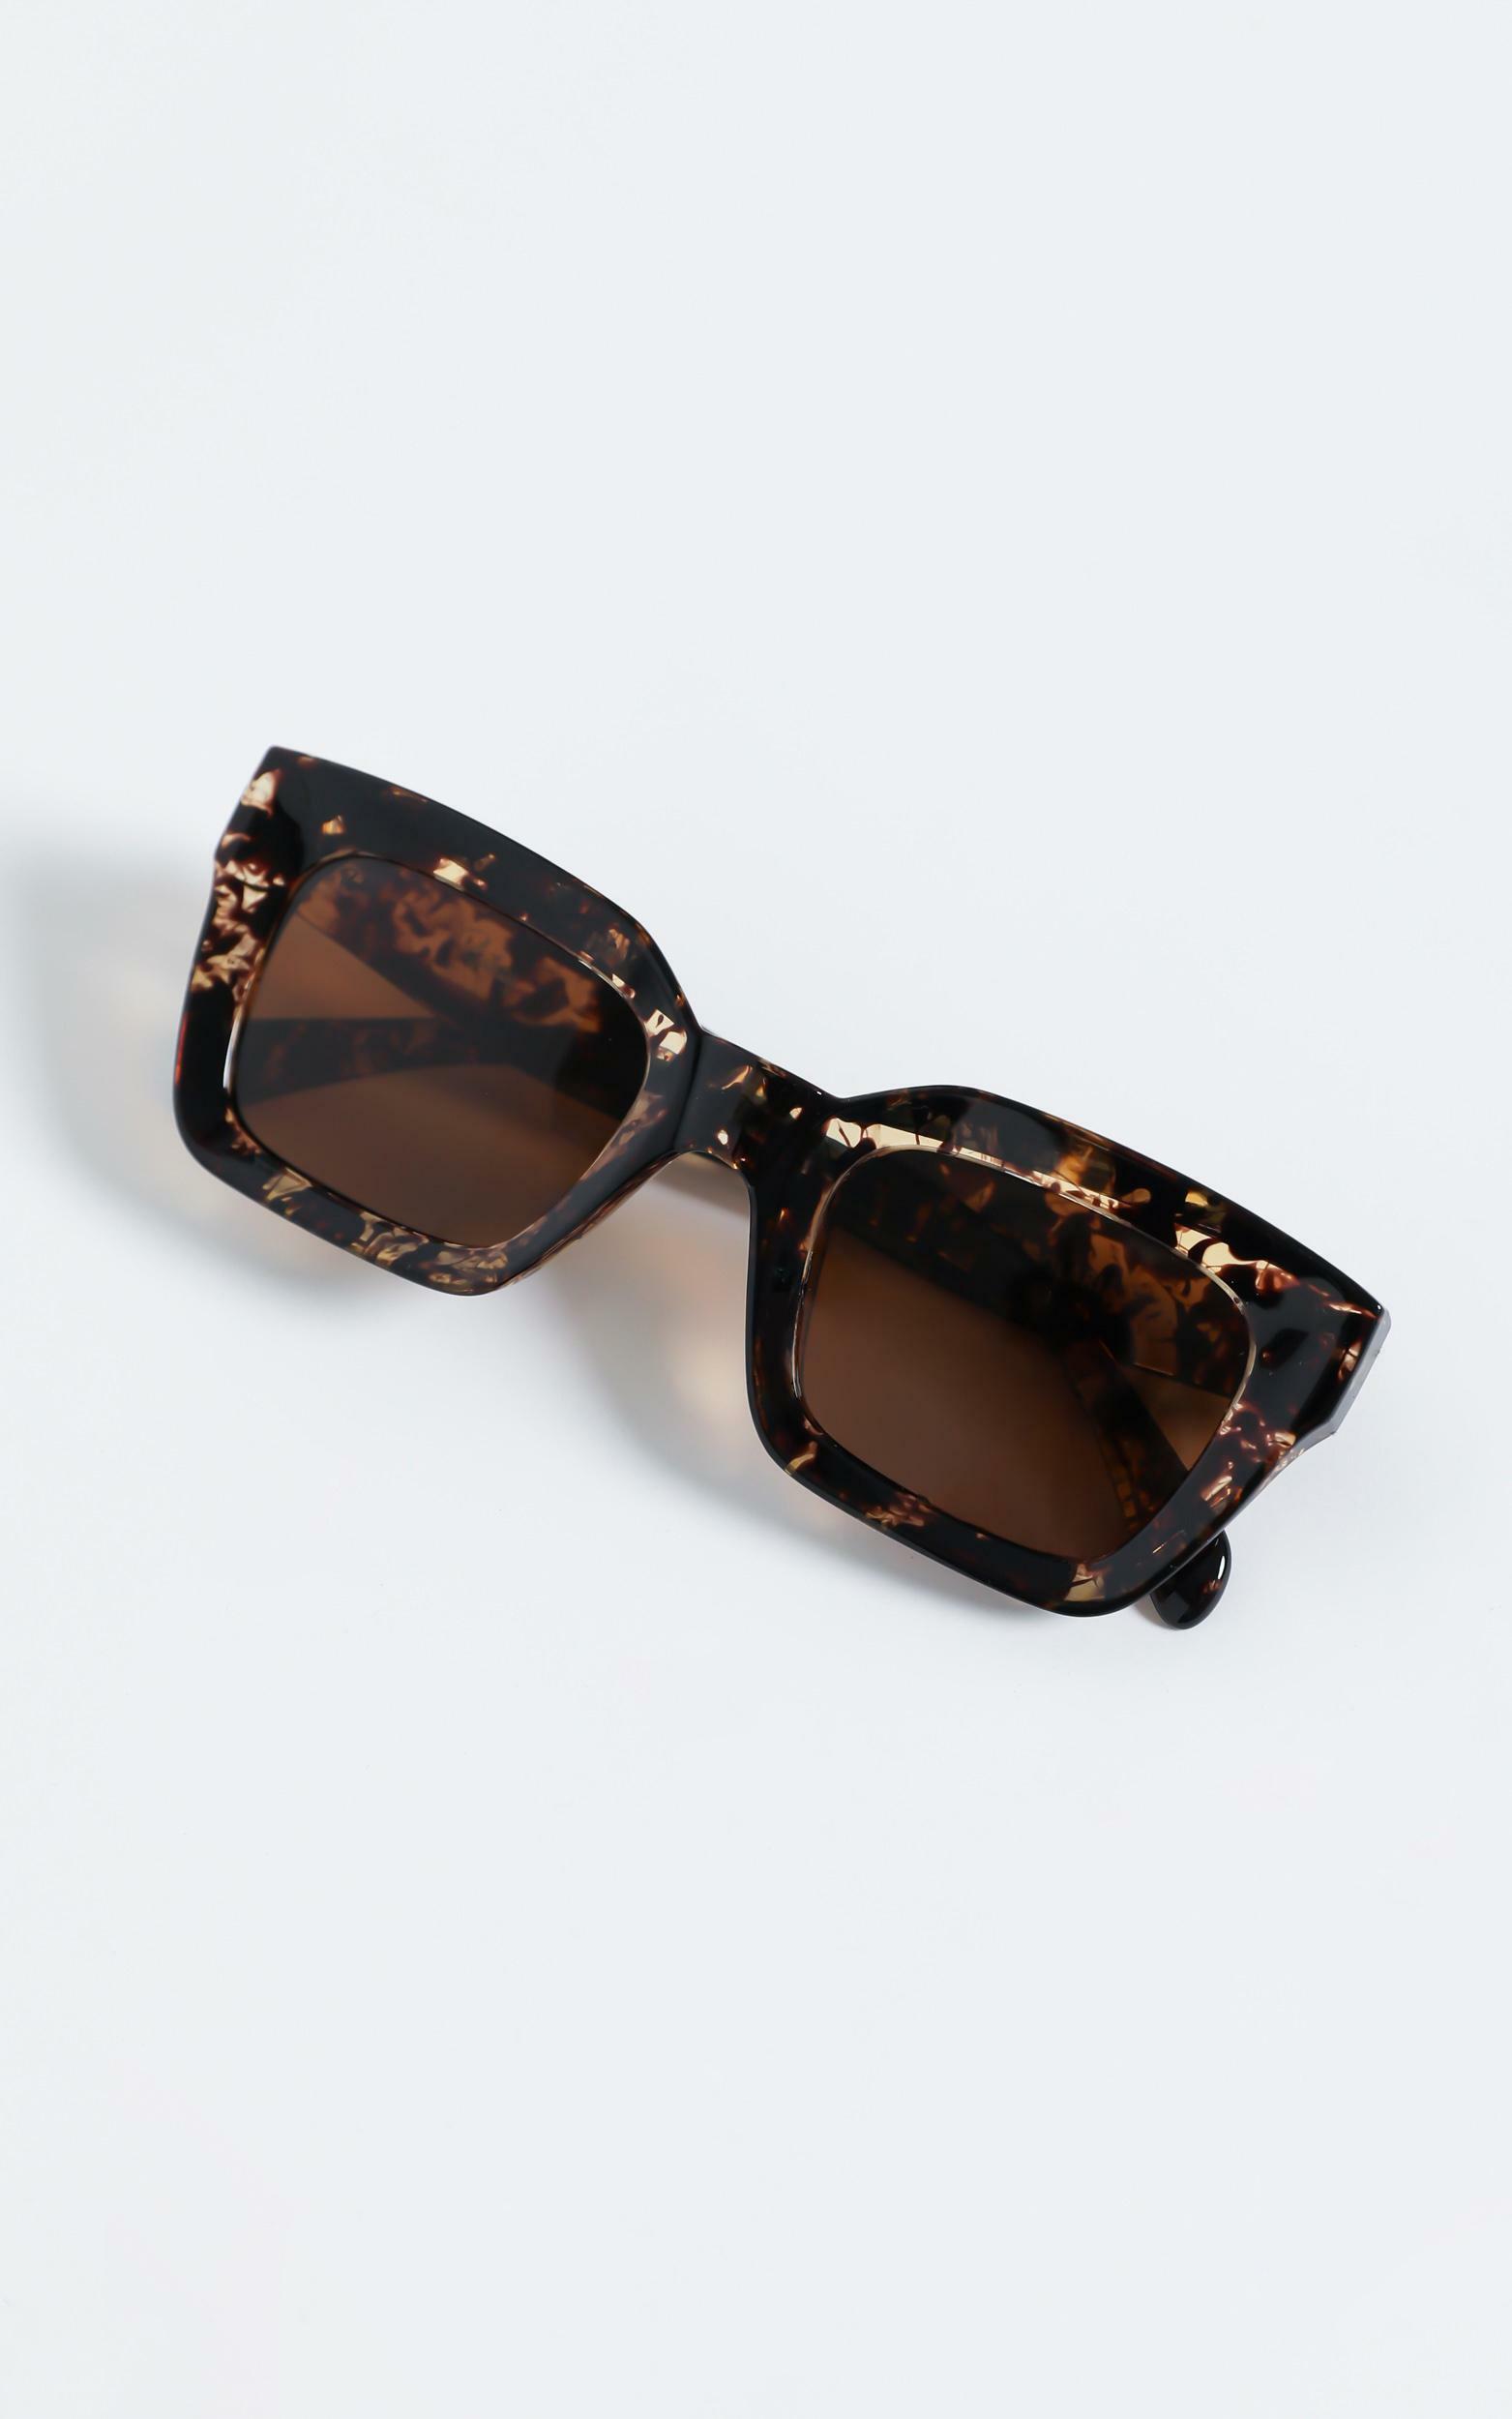 Reality Eyewear - Onassis Sunglasses in Turtle, BRN2, hi-res image number null